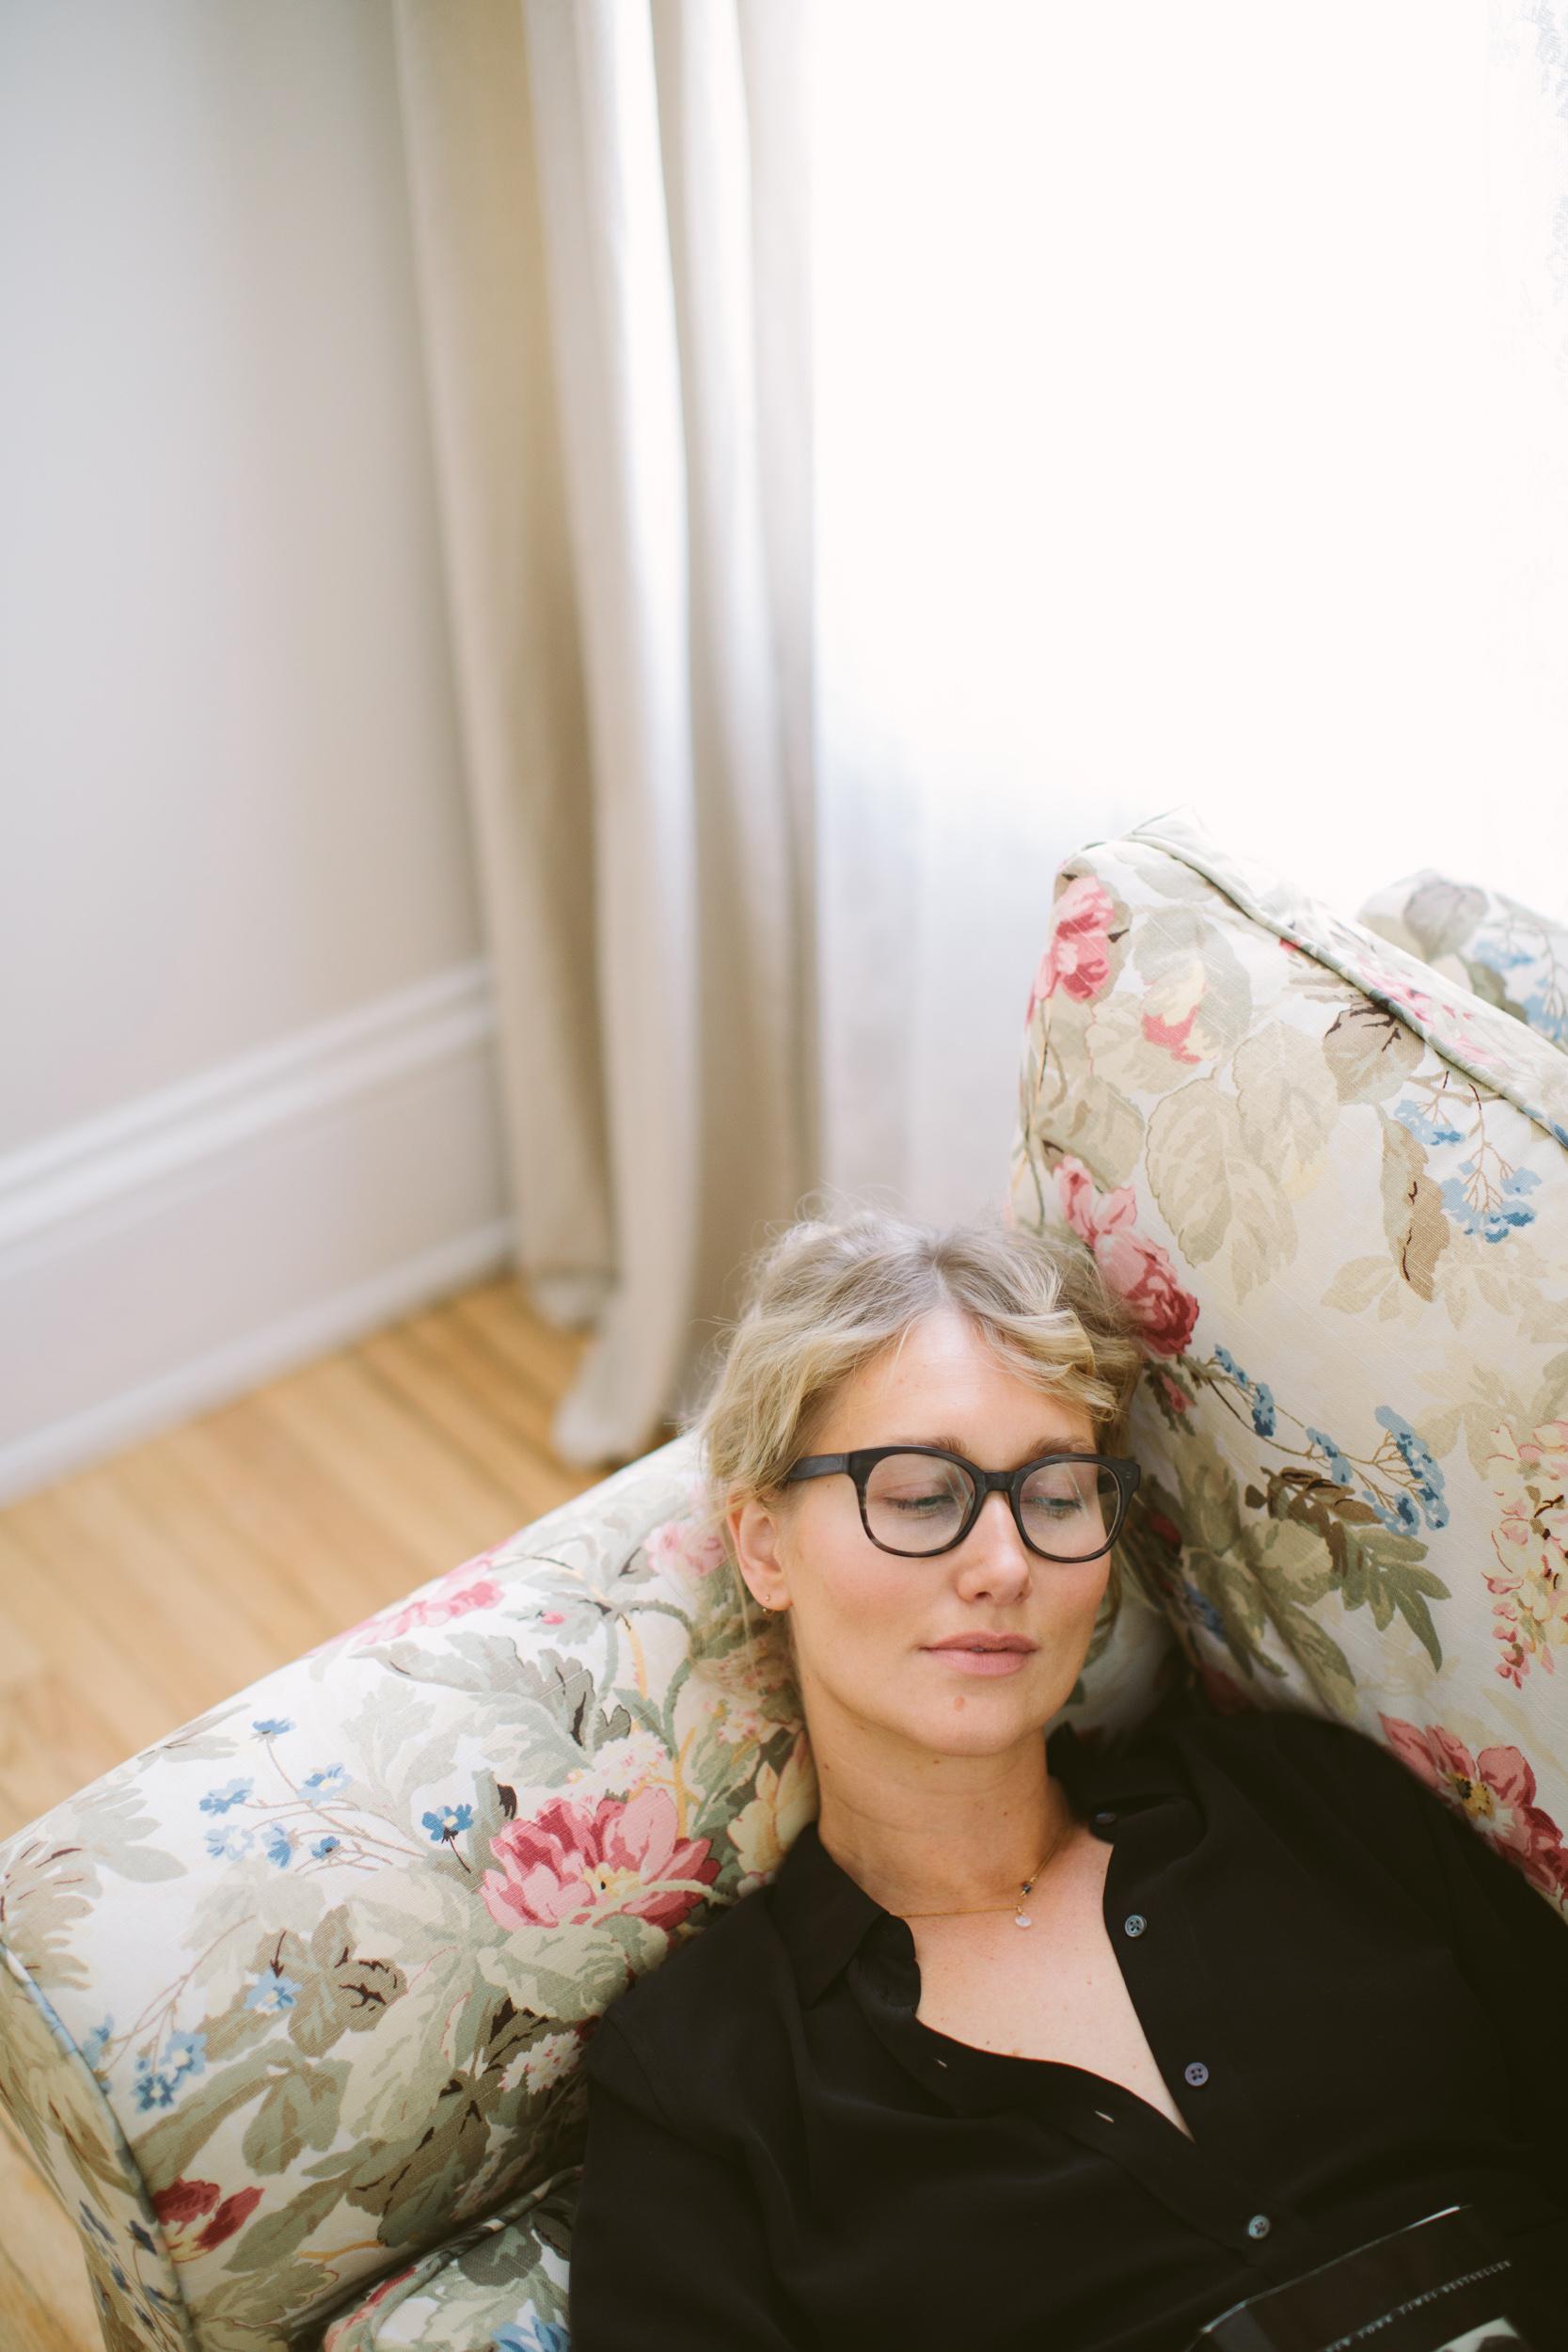 Melissa-Sung-Toronto-Portrait-Photographer-21.jpg